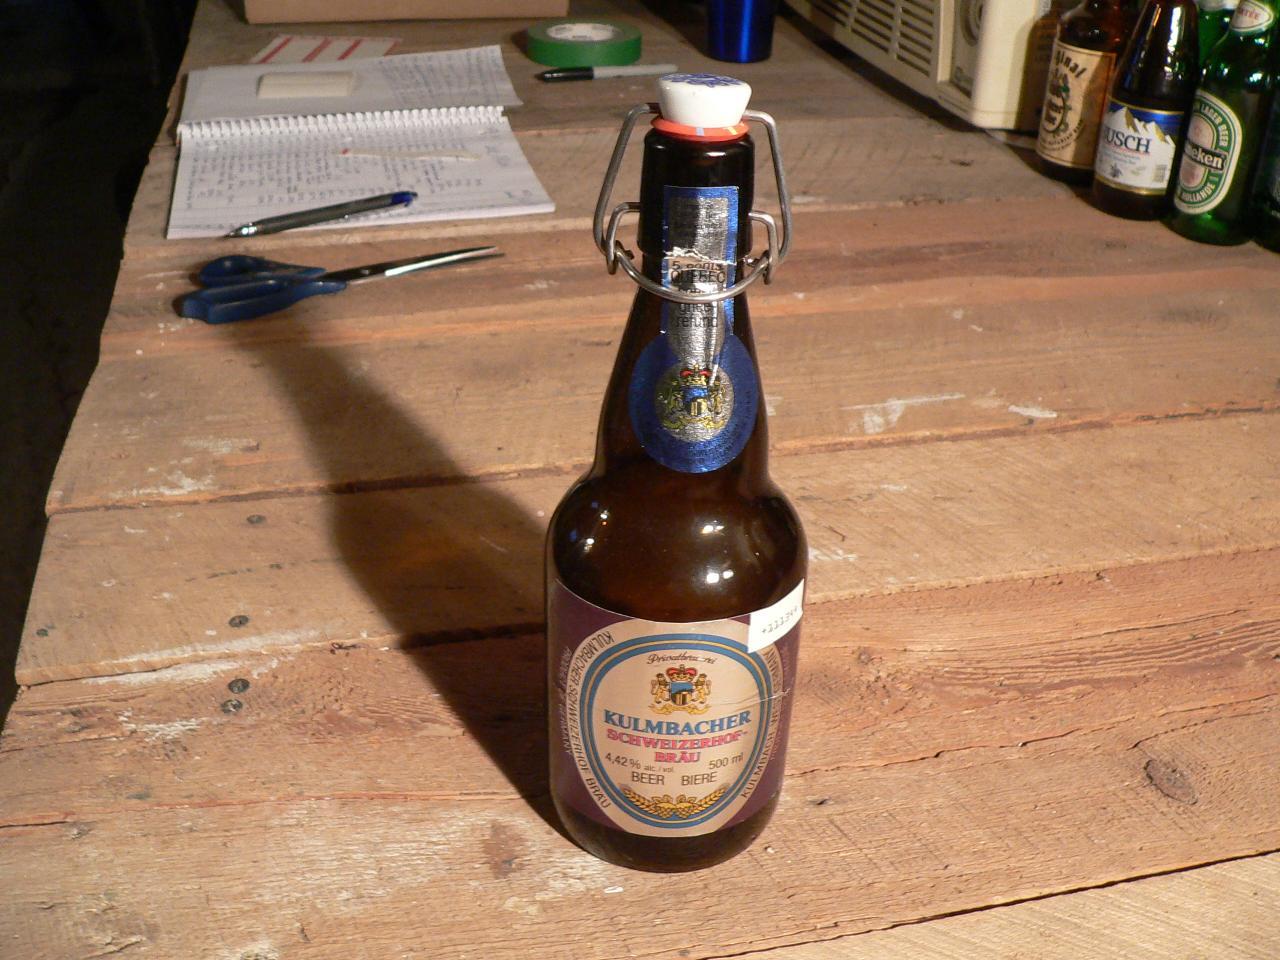 Biere kulmbacher schweizerhof-brau # 4739.40